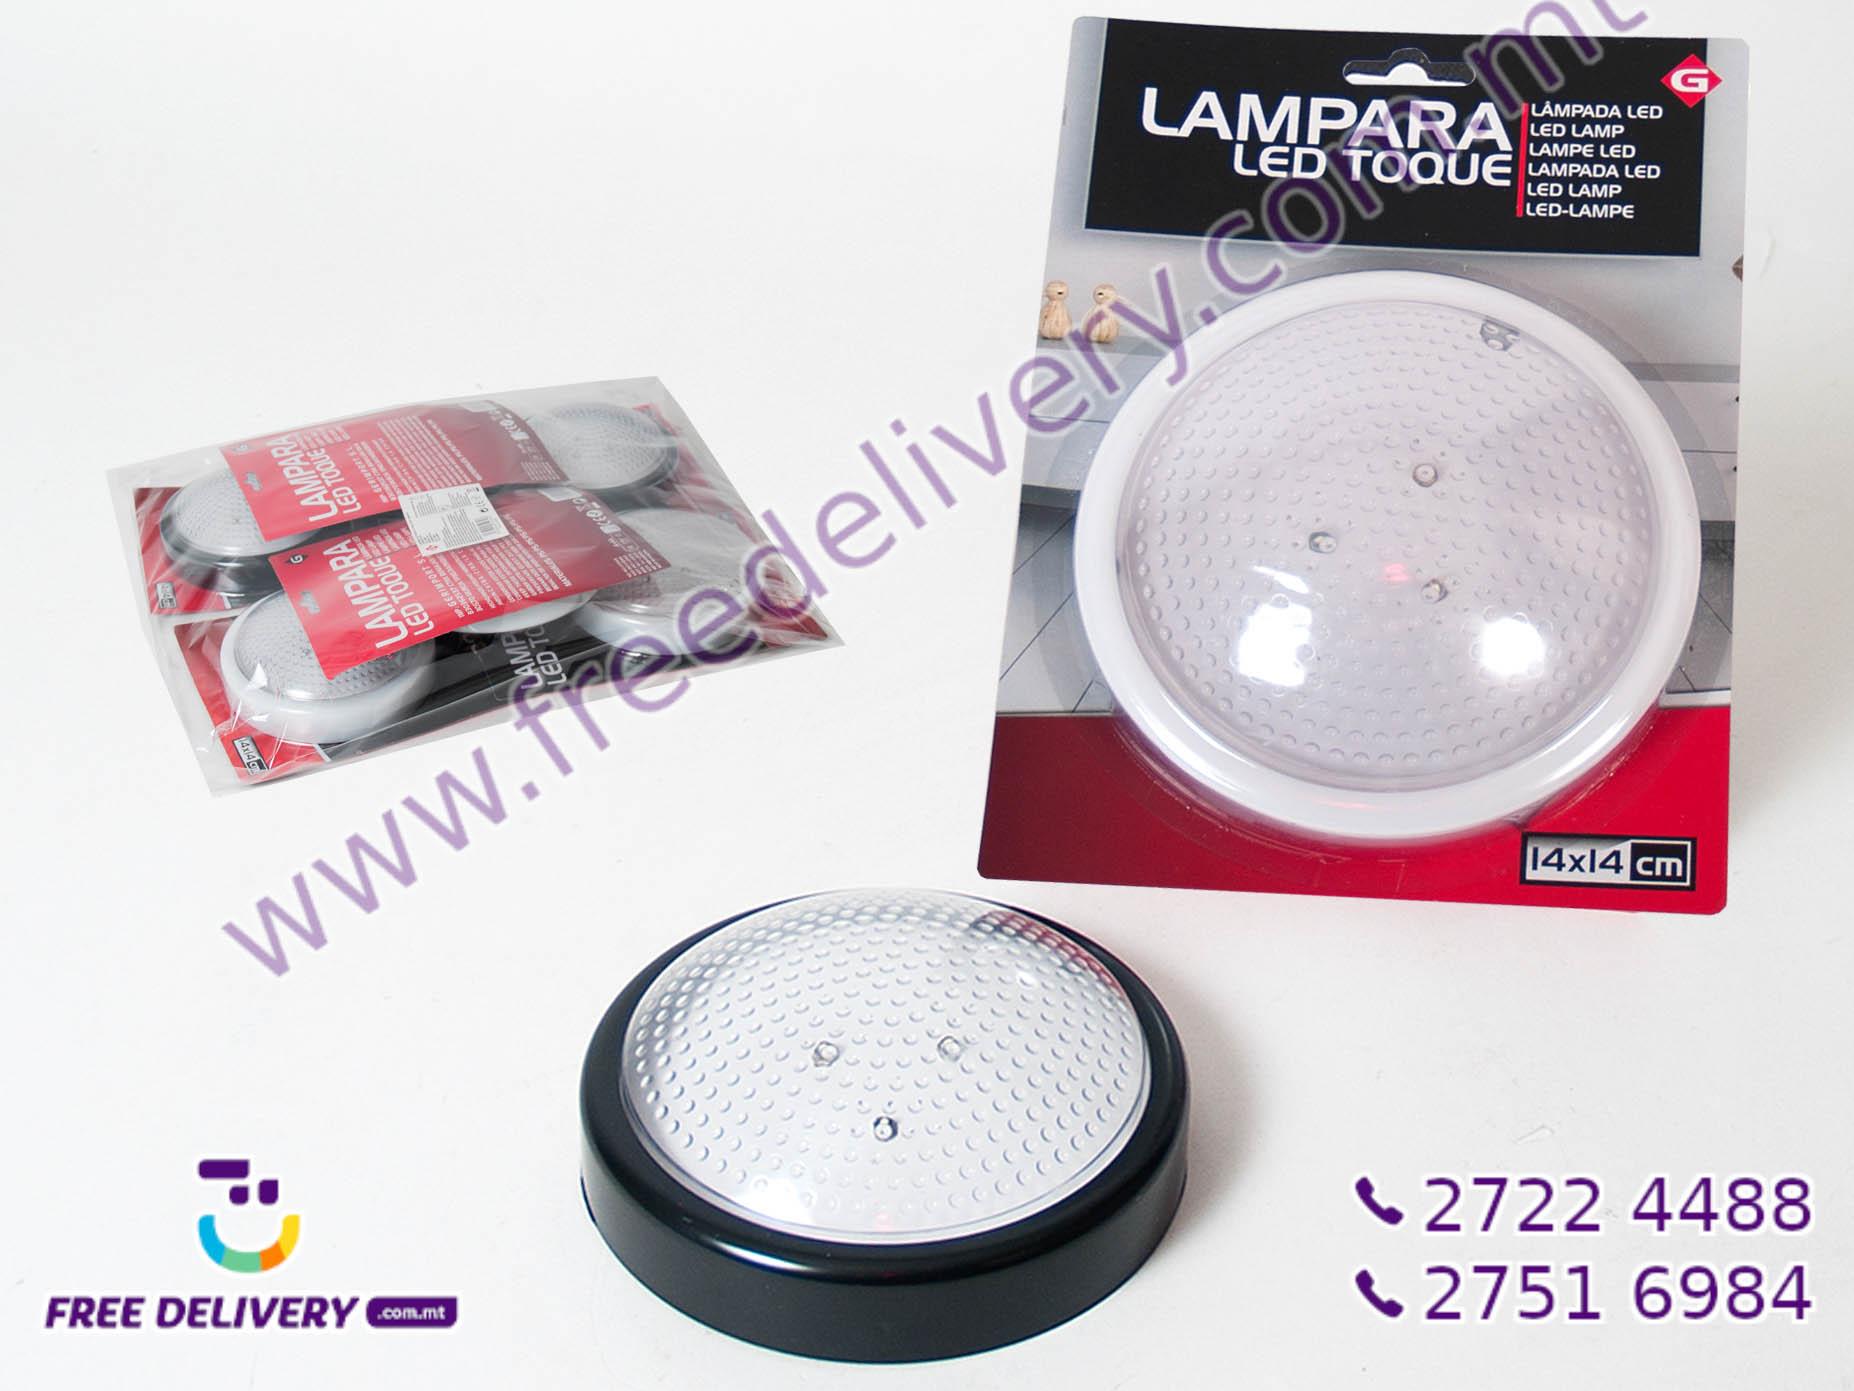 LED LAMP 14CMx14CM GE729307